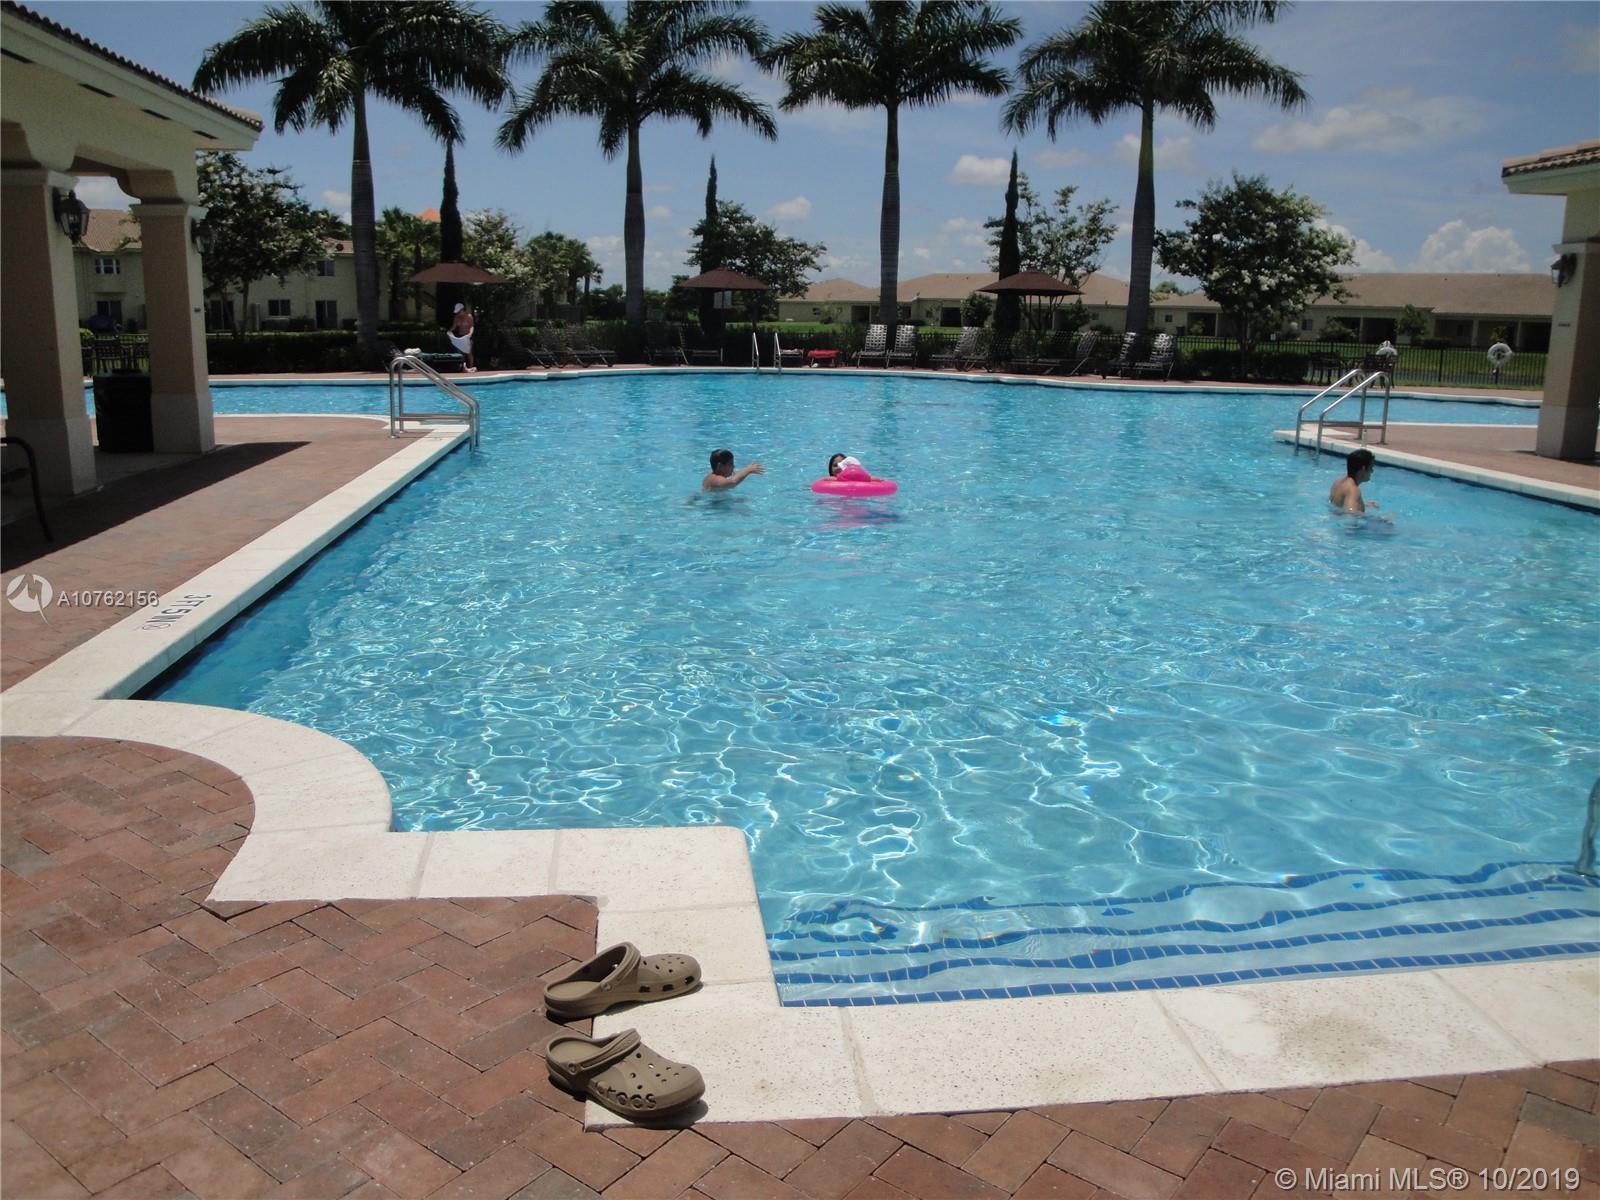 3370 NE 14 DR #102, Homestead, FL 33033 - Homestead, FL real estate listing